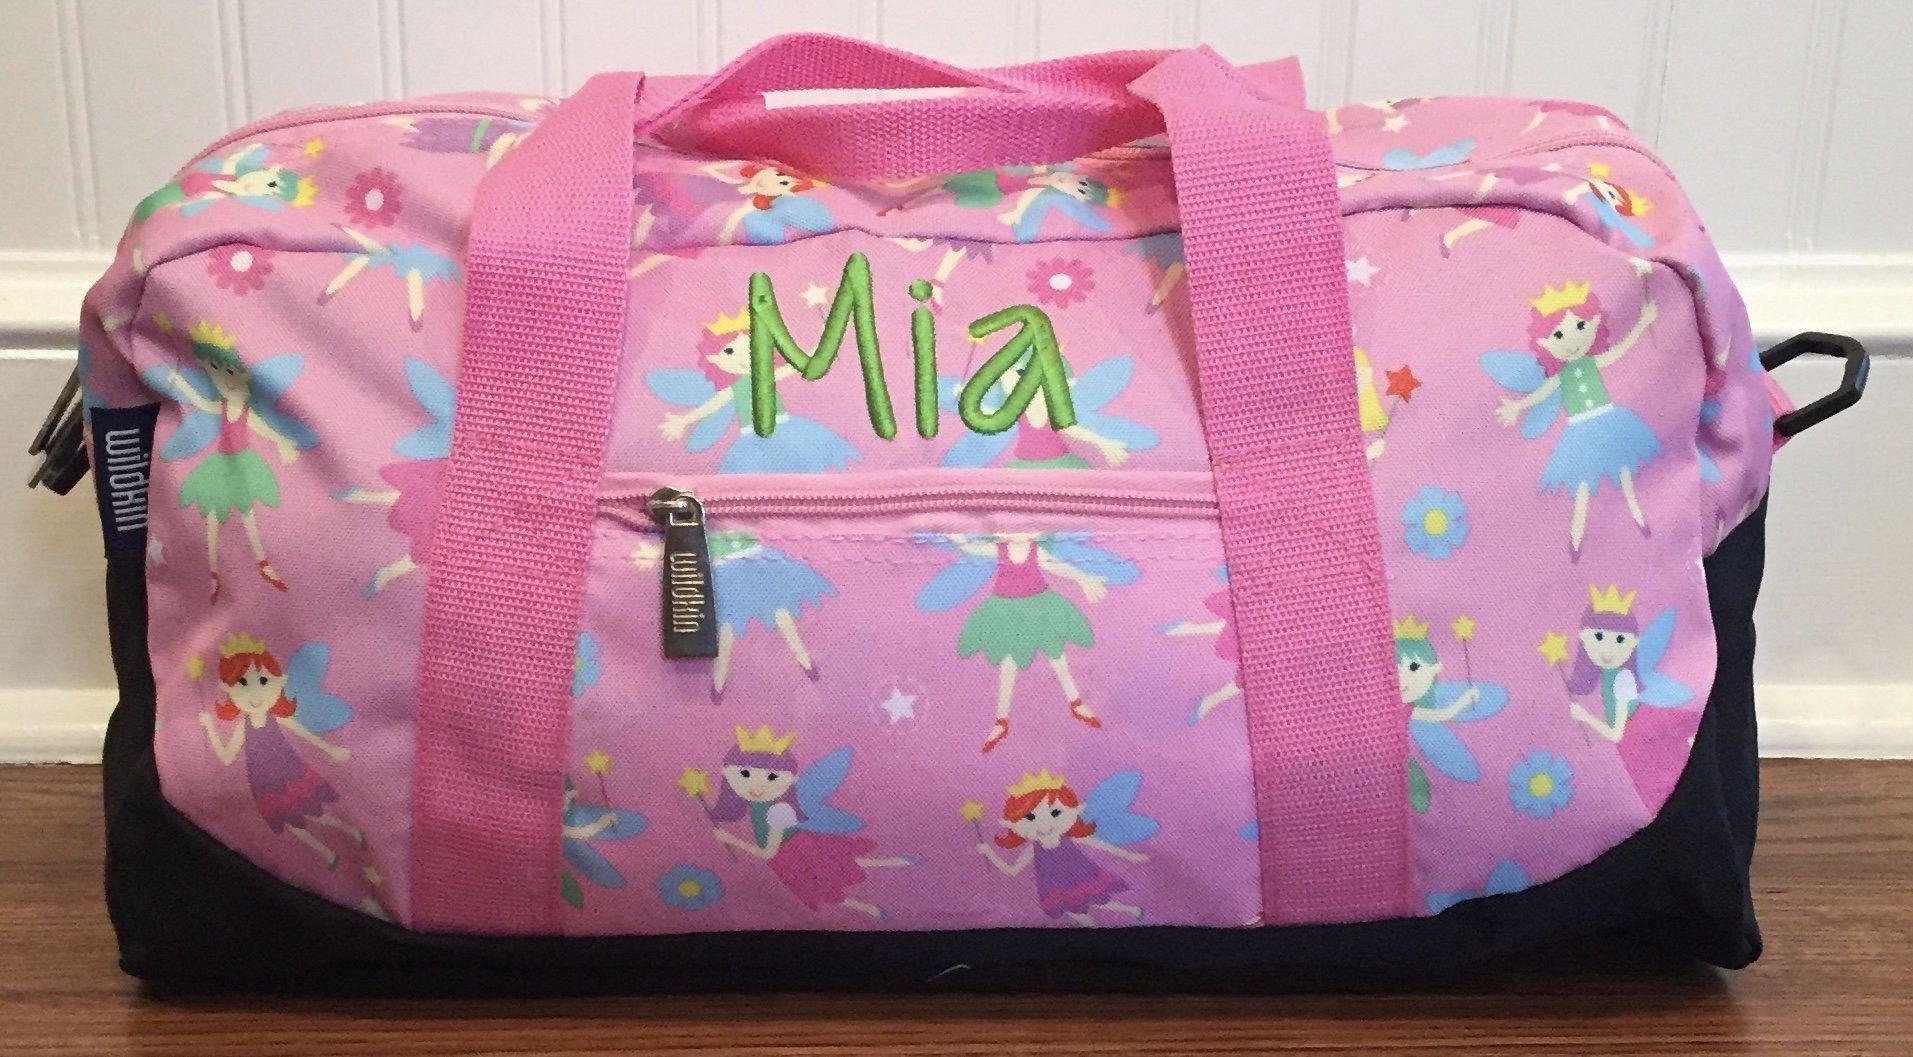 Girls Duffel Bag Overnight Bag Girls Birthday Gift Carry On